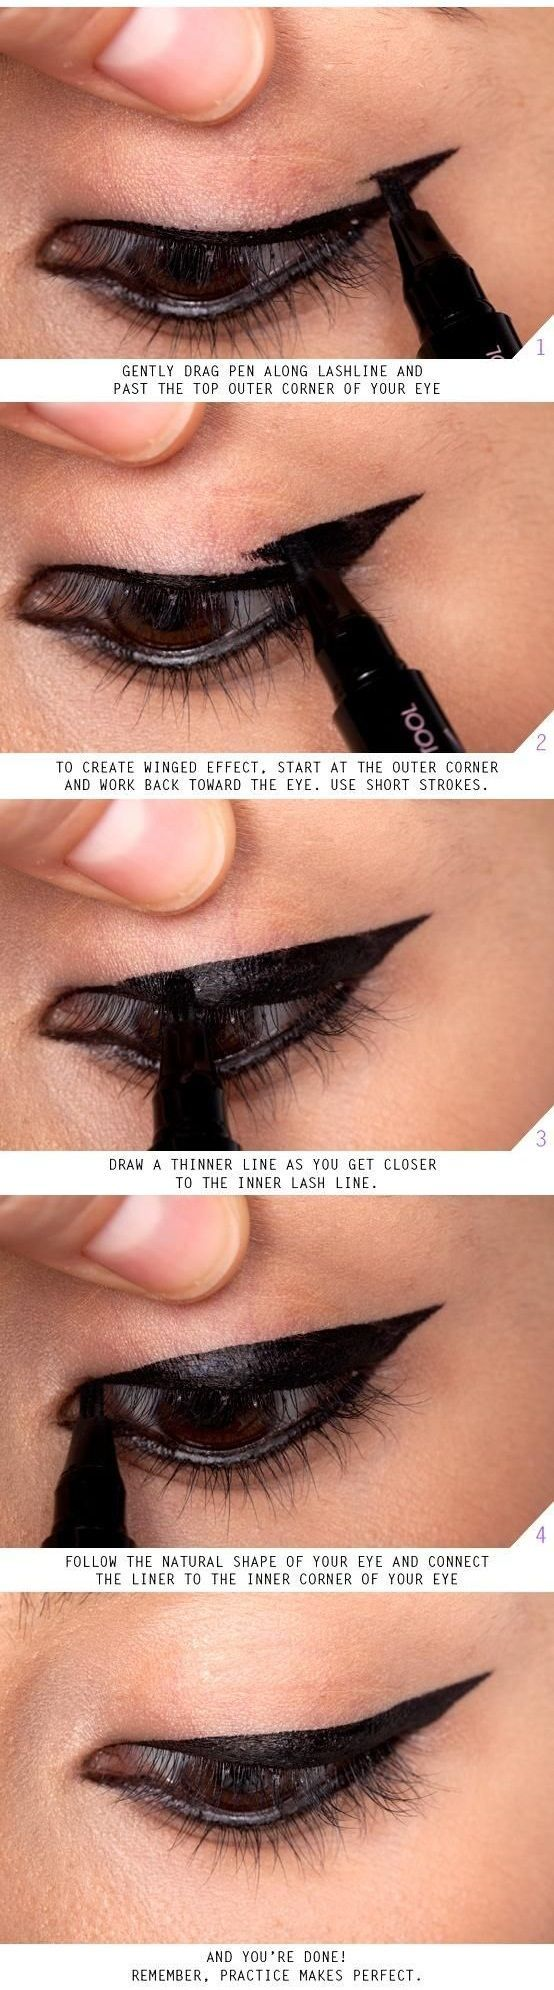 Makeup Tips and Tutorials! Vintage Triple Winged Eyeliner